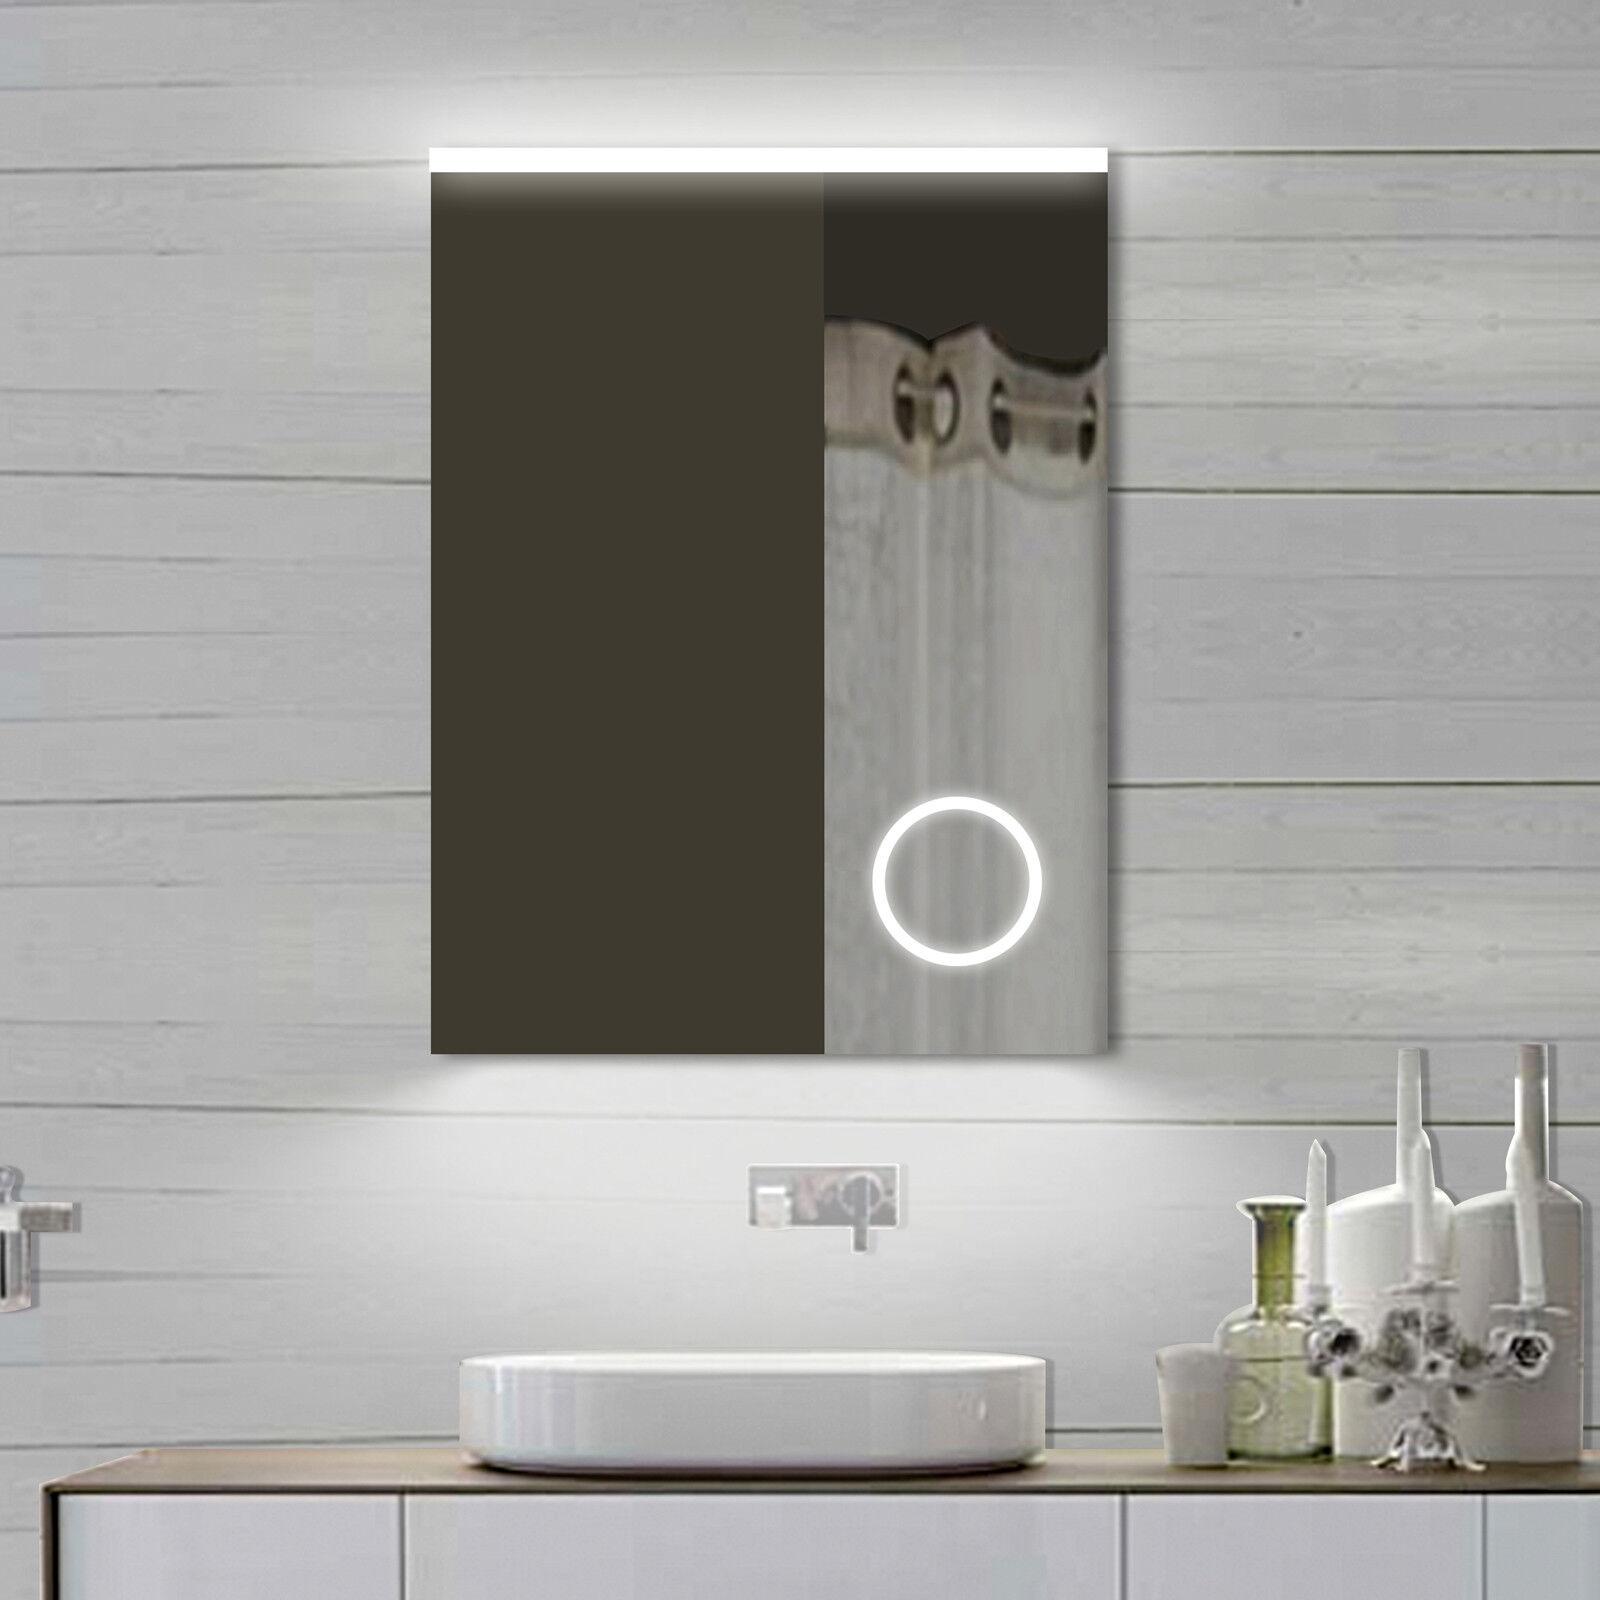 LED Beleuchtung Kalt Warm weiiß licht Wand Bad Badezimmer Schmink spiegel 62x80